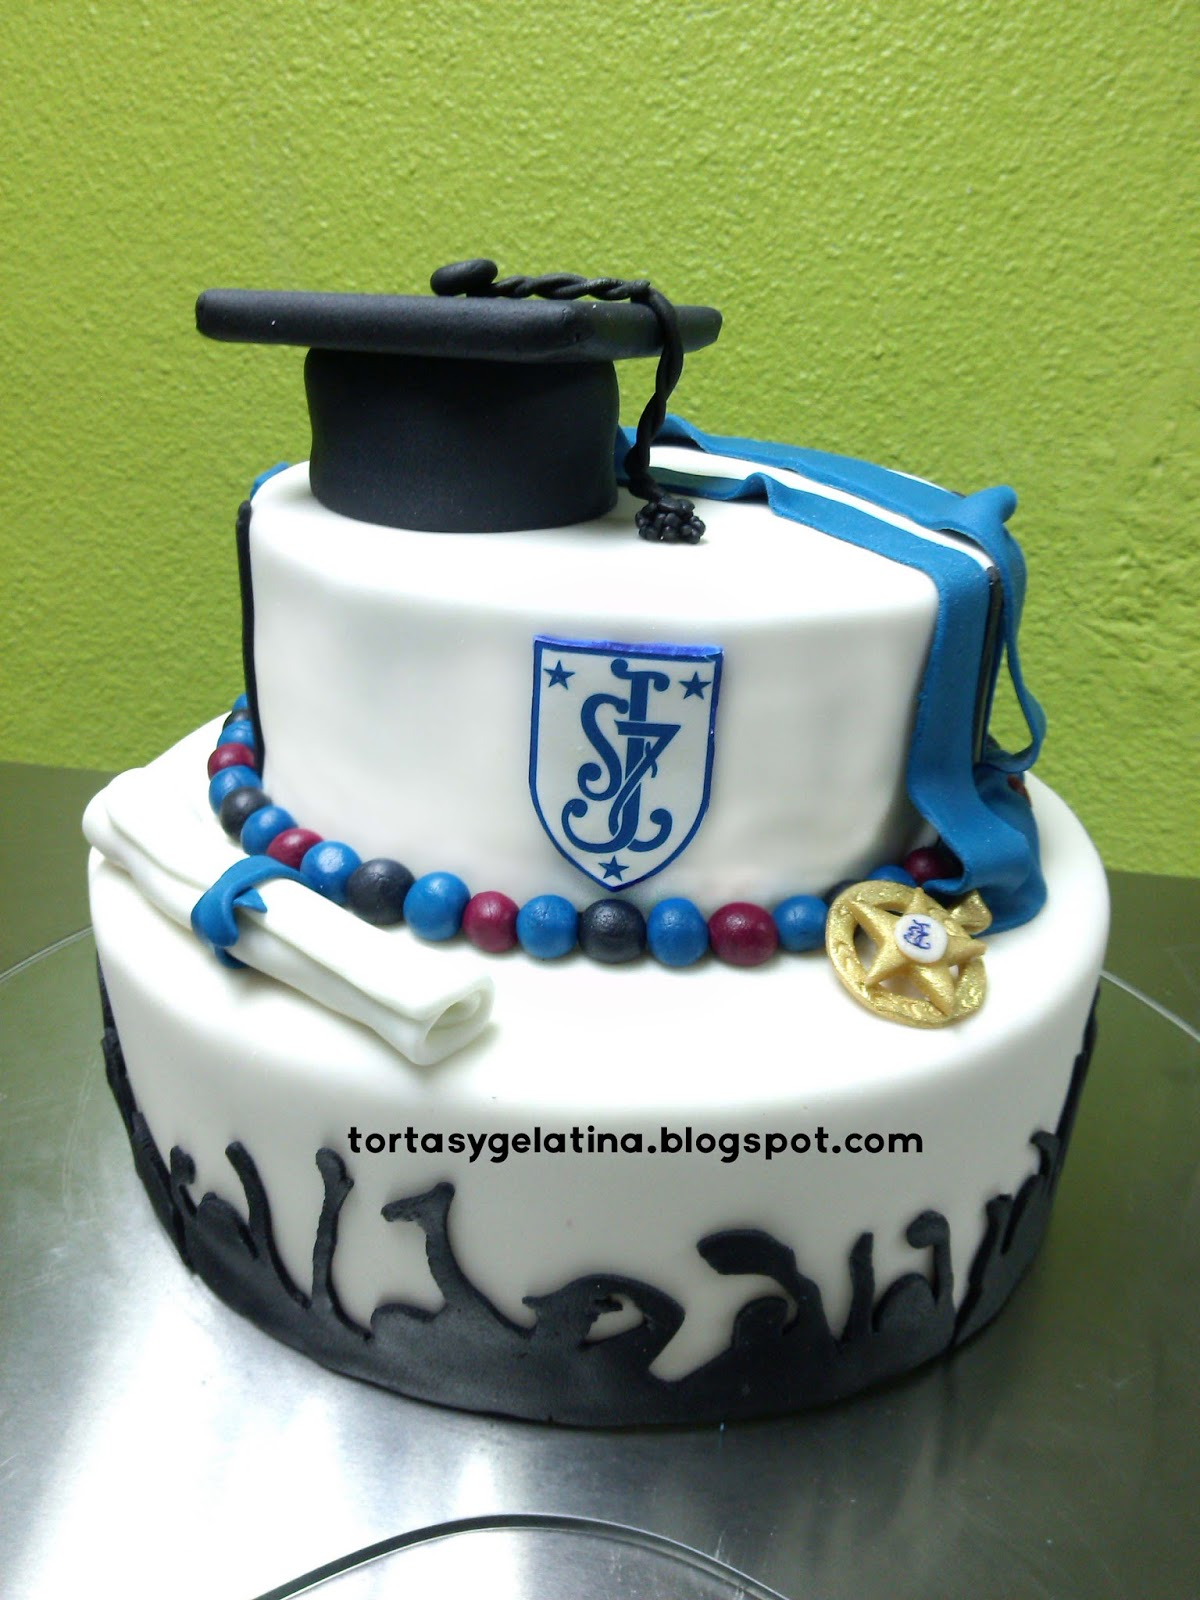 Tortas de graduacion utilisima tortas de graduaci 243 n for Utilisima decoracion